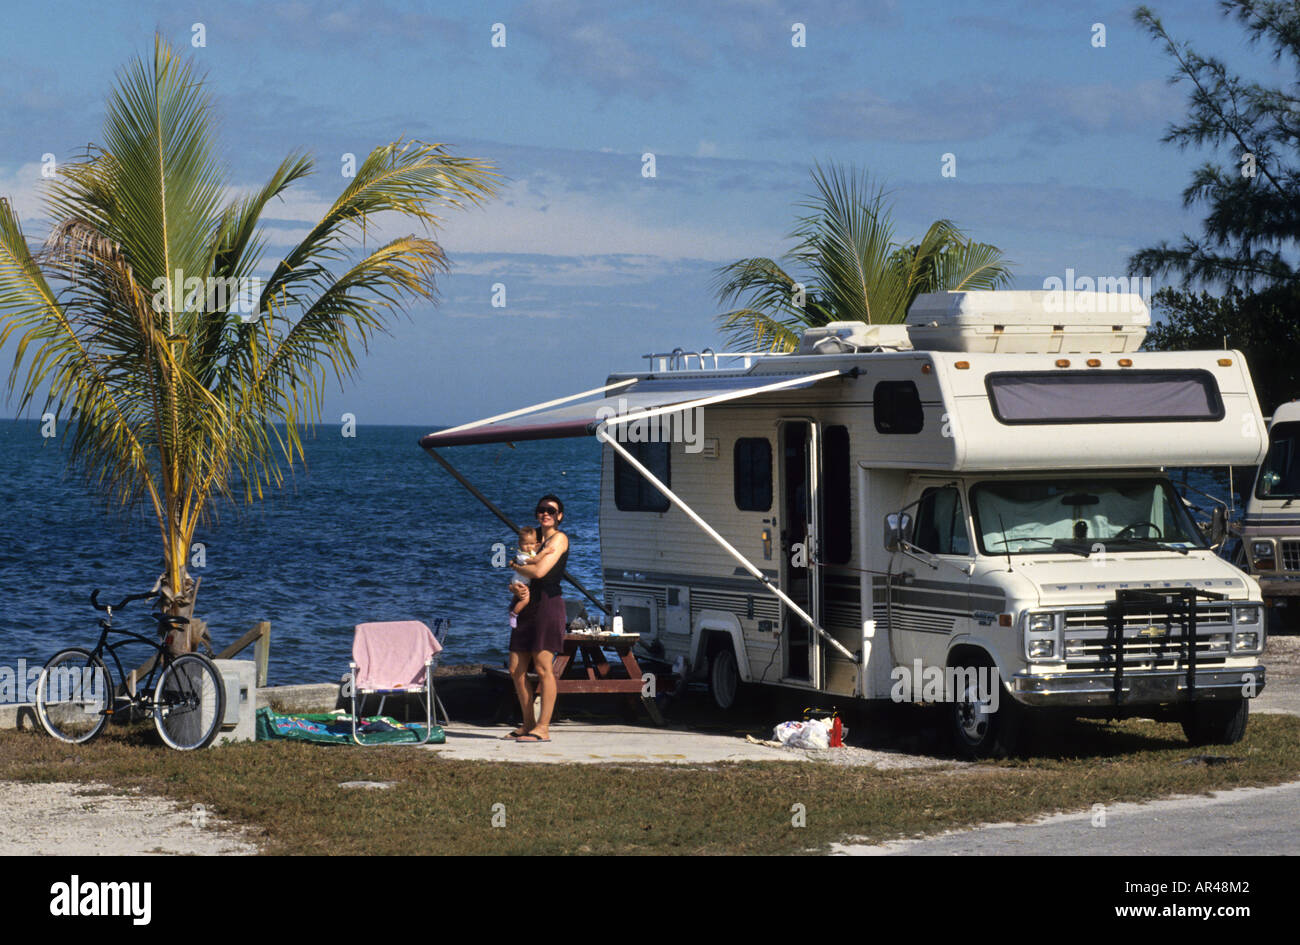 Usa United States Camping Site Caravan Park Stock Photo 9104961 Alamy